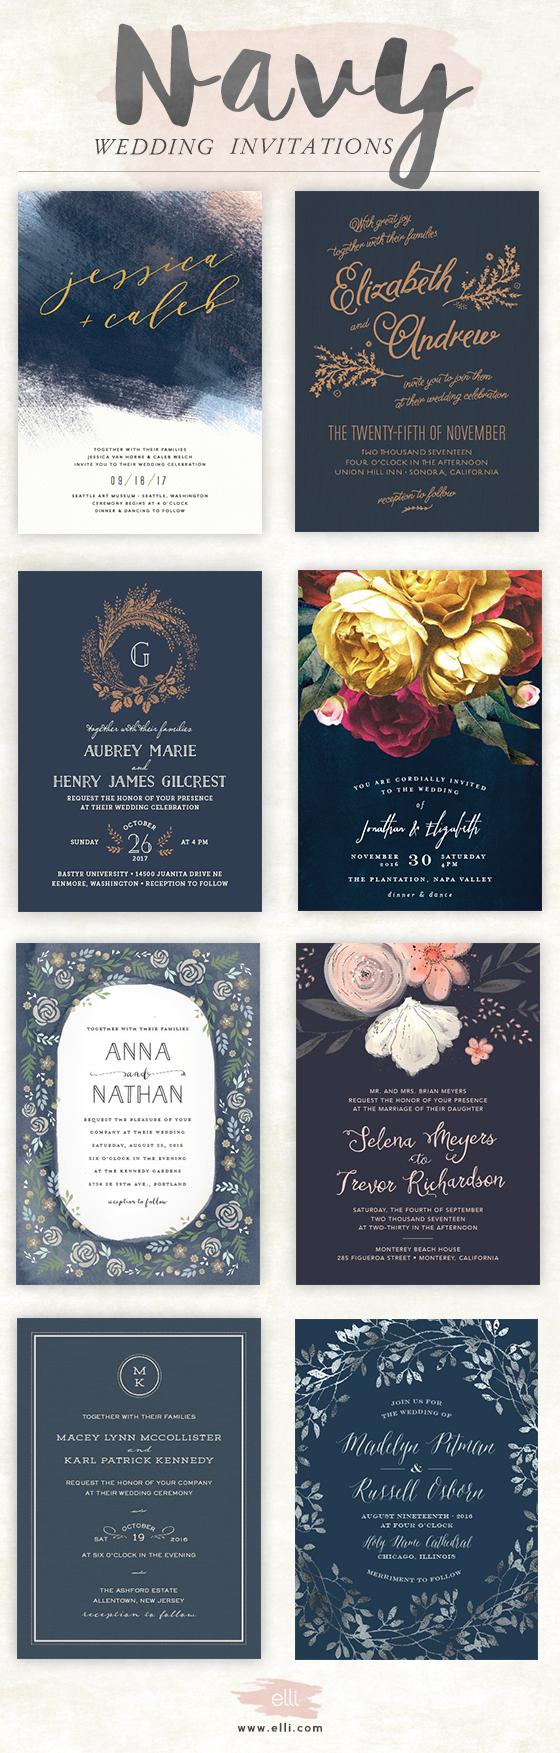 Full hd diy wedding rsvp cards for desktop pics now trending navy invitations from ellicom